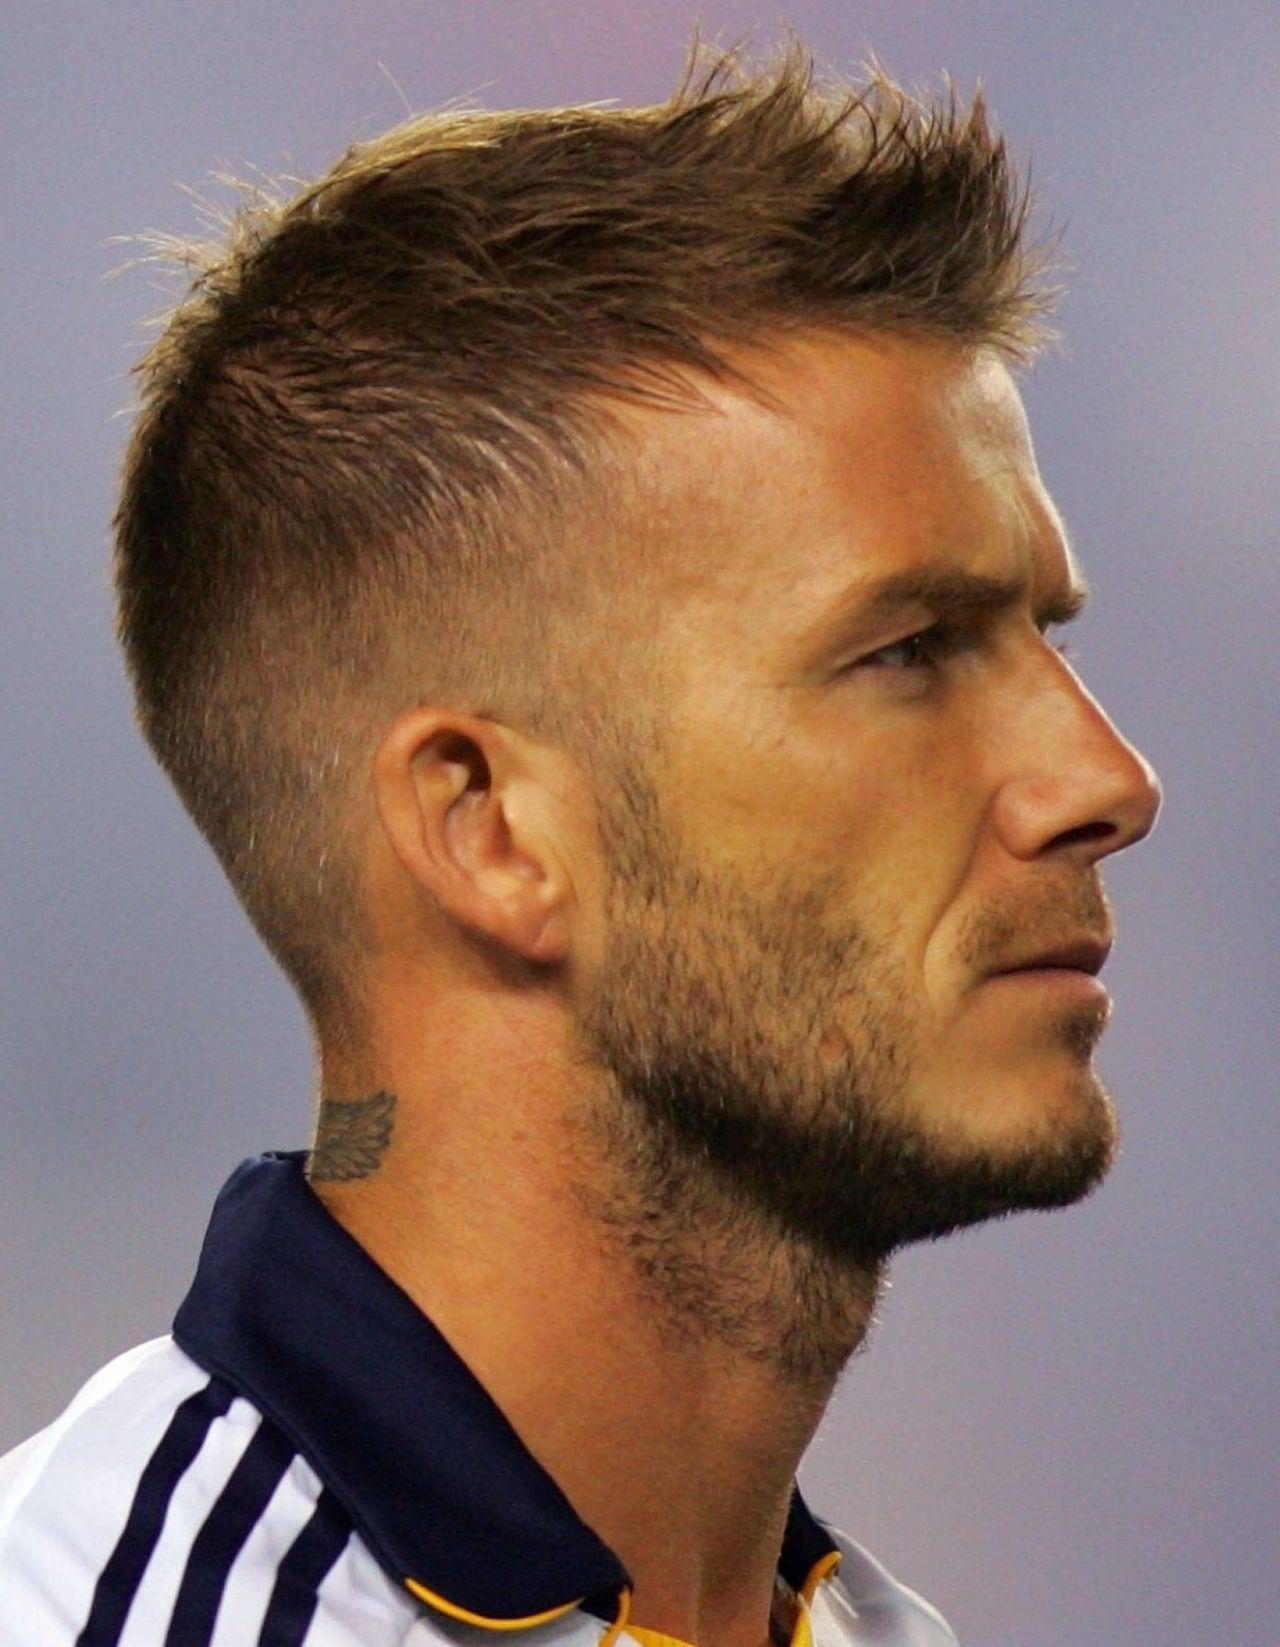 26 Stylish Haircuts For Men Thin Hair Men Mens Hairstyles Short Boys Haircuts